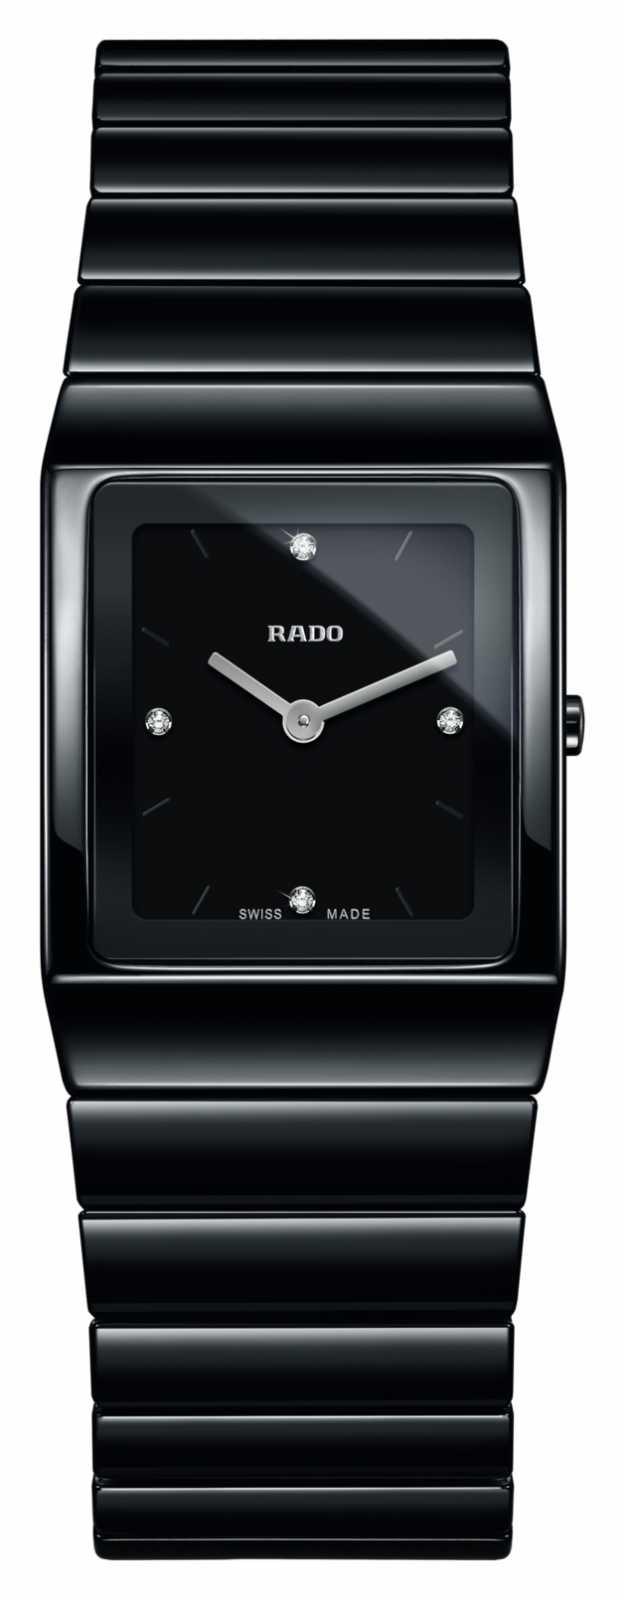 RADO Ceramica Diamonds Square Dial Black Ceramic Bracelet Watch R21702702